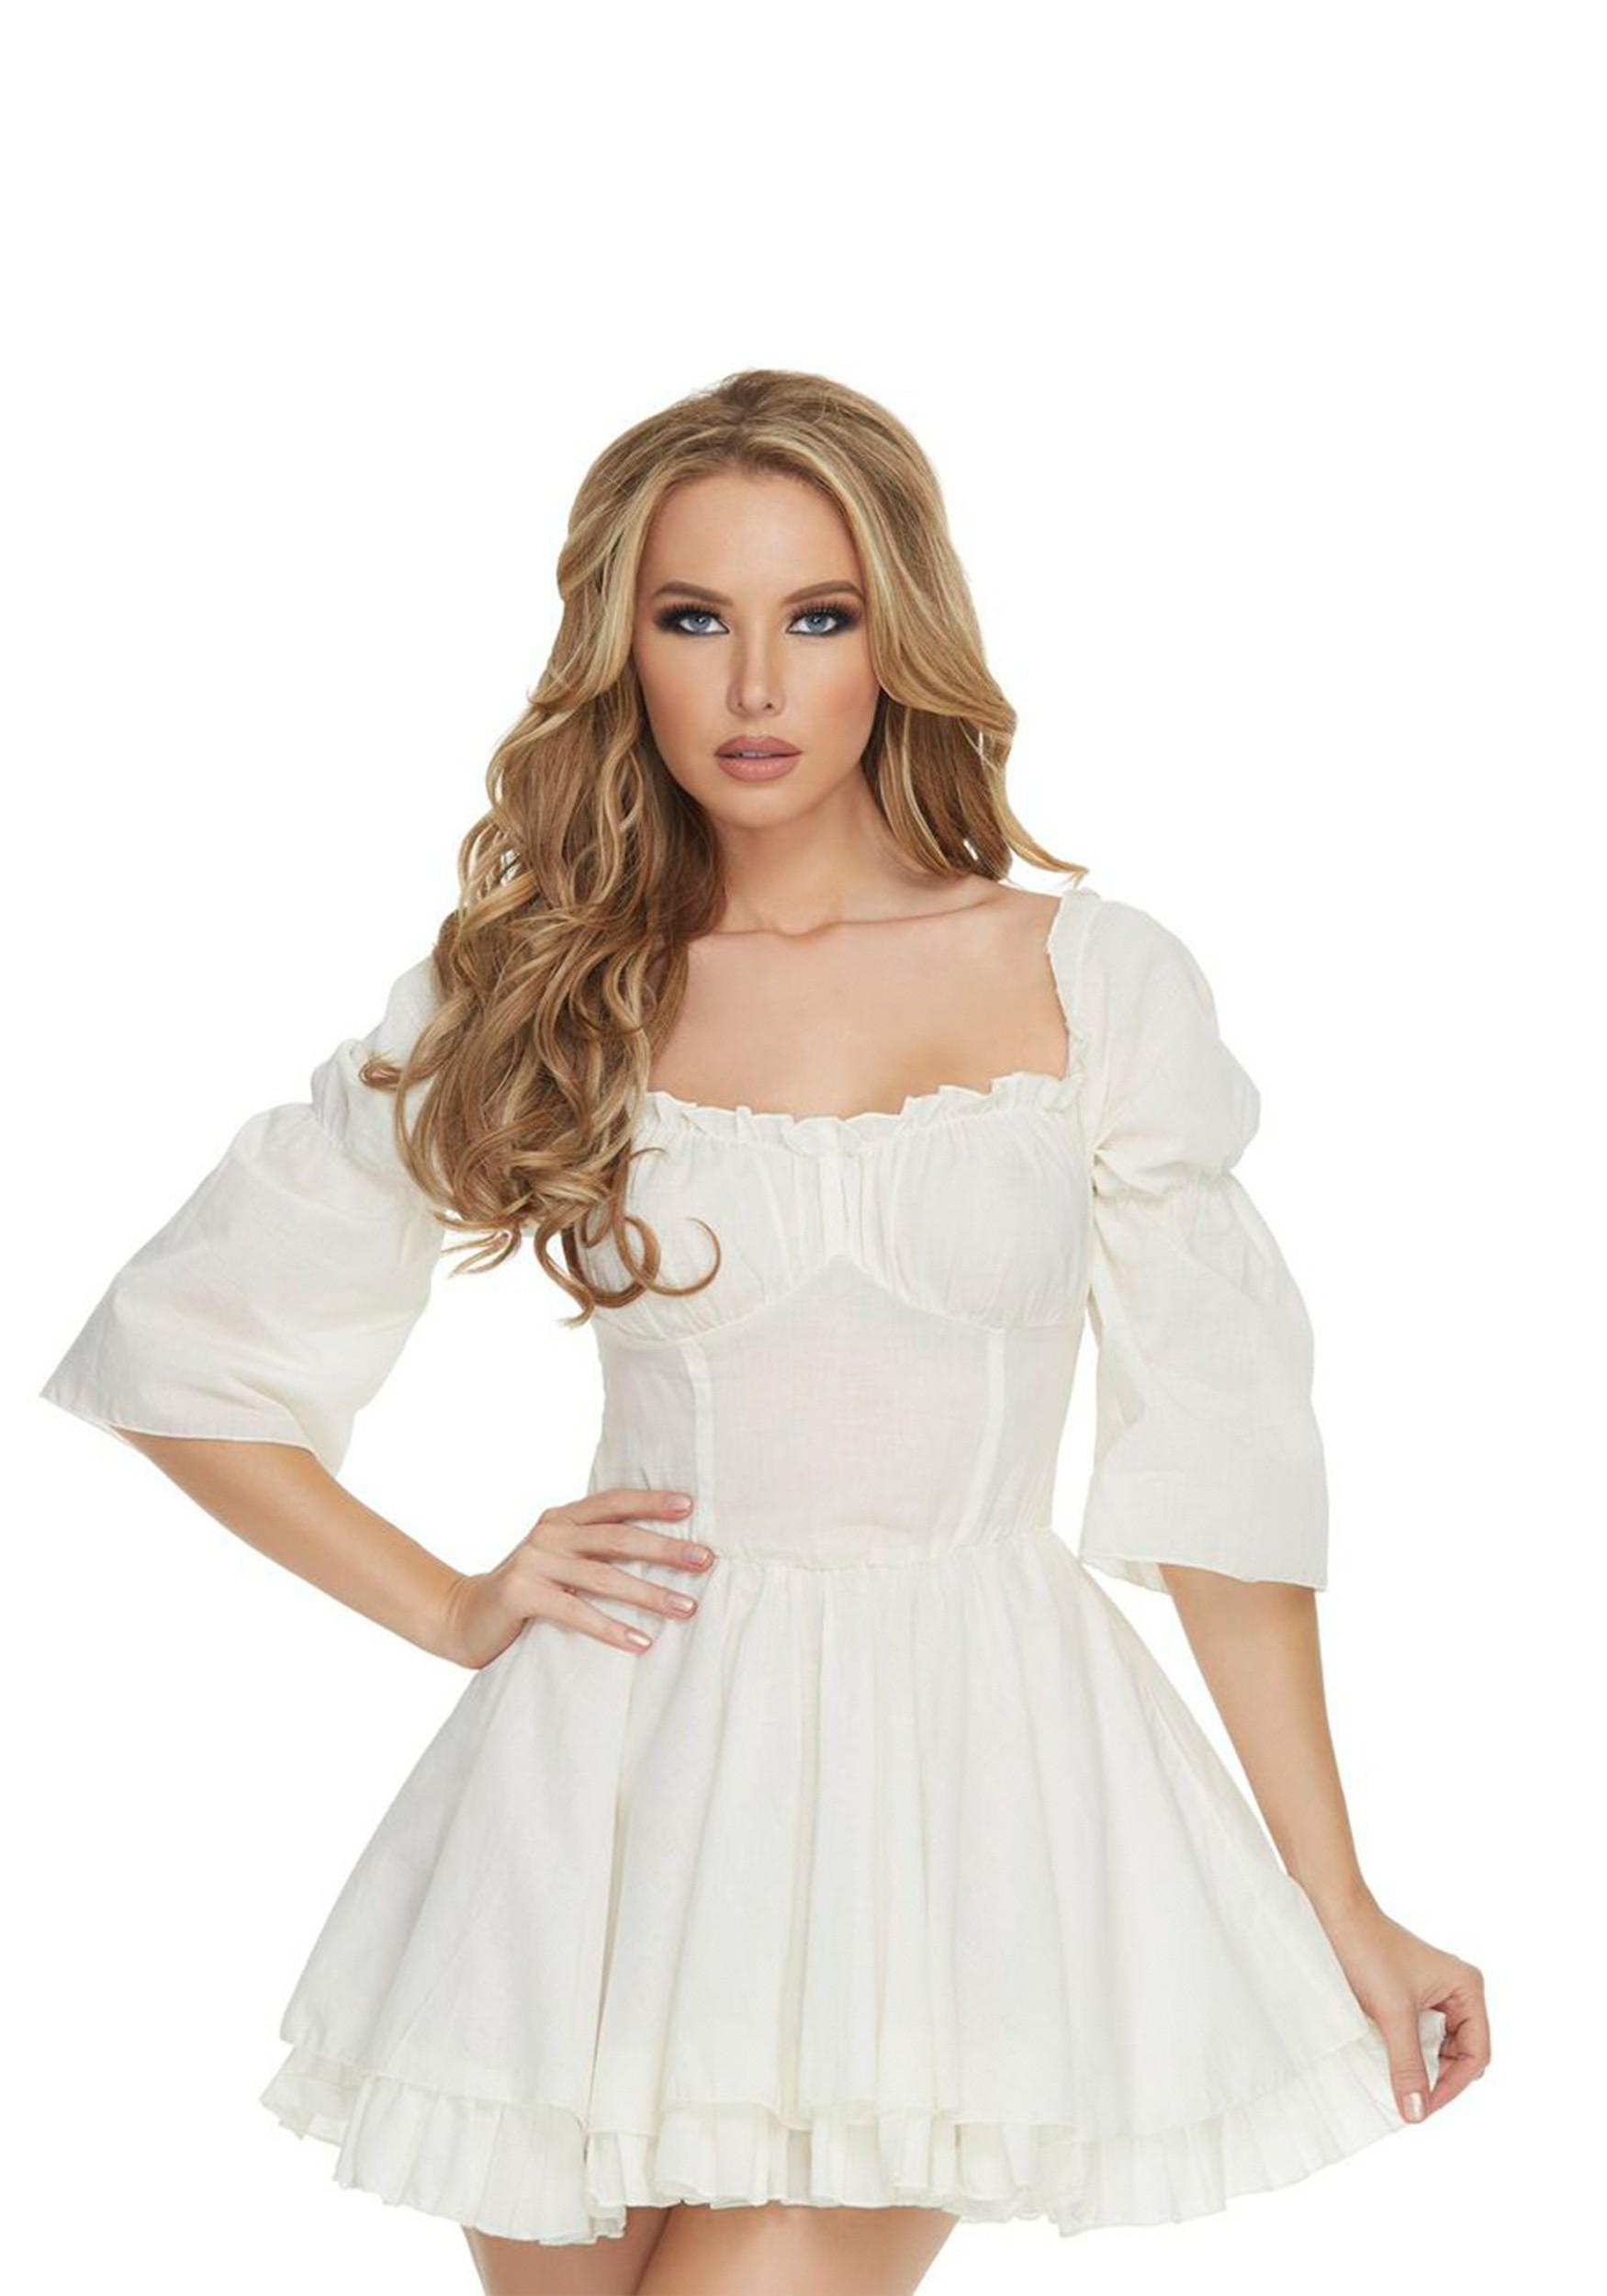 Womens Pirate Dress Costume-8477